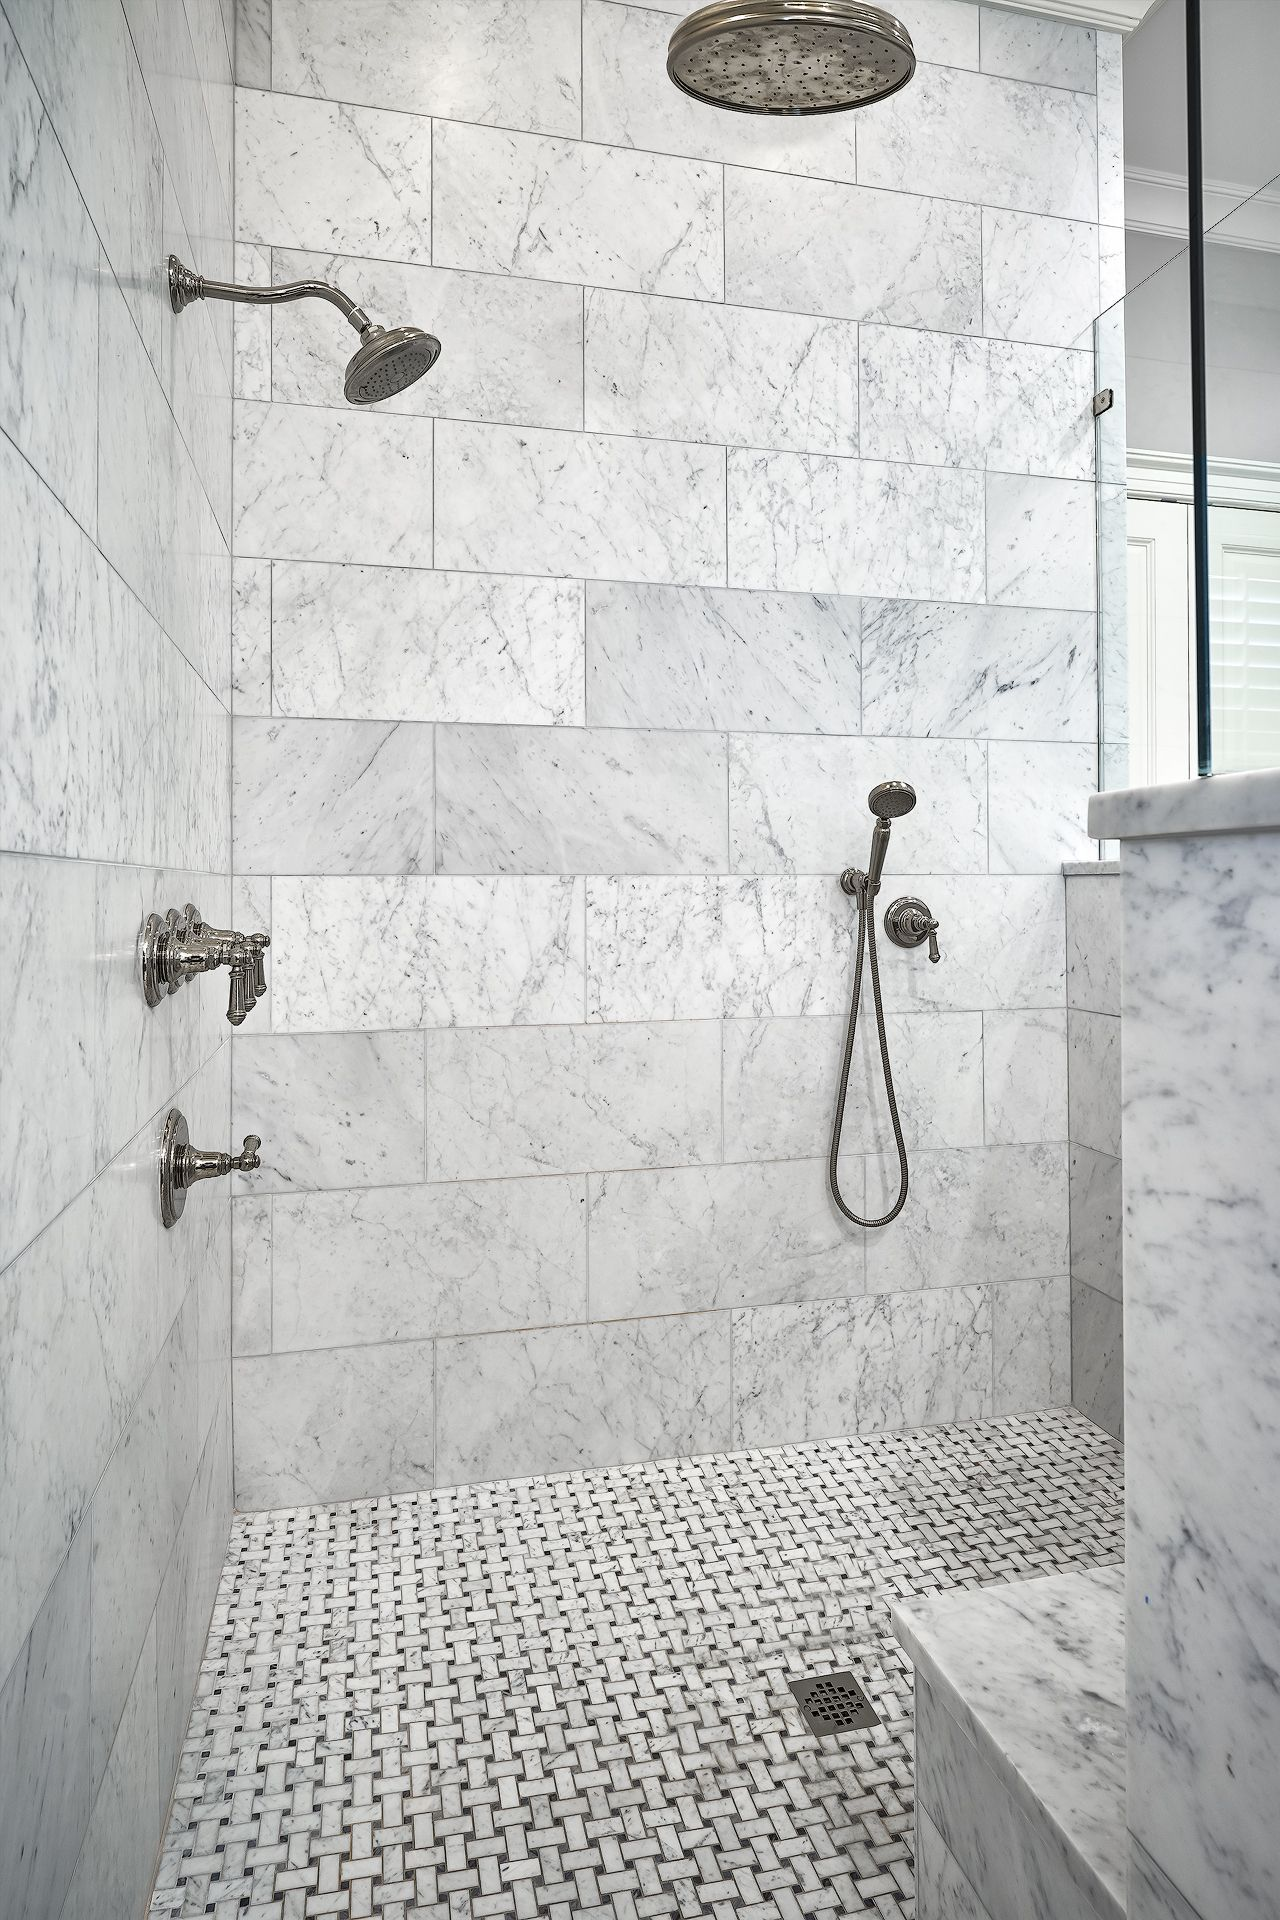 10 Amazing Subway Tile Bathroom Ideas - Home Inspirations | Best ...